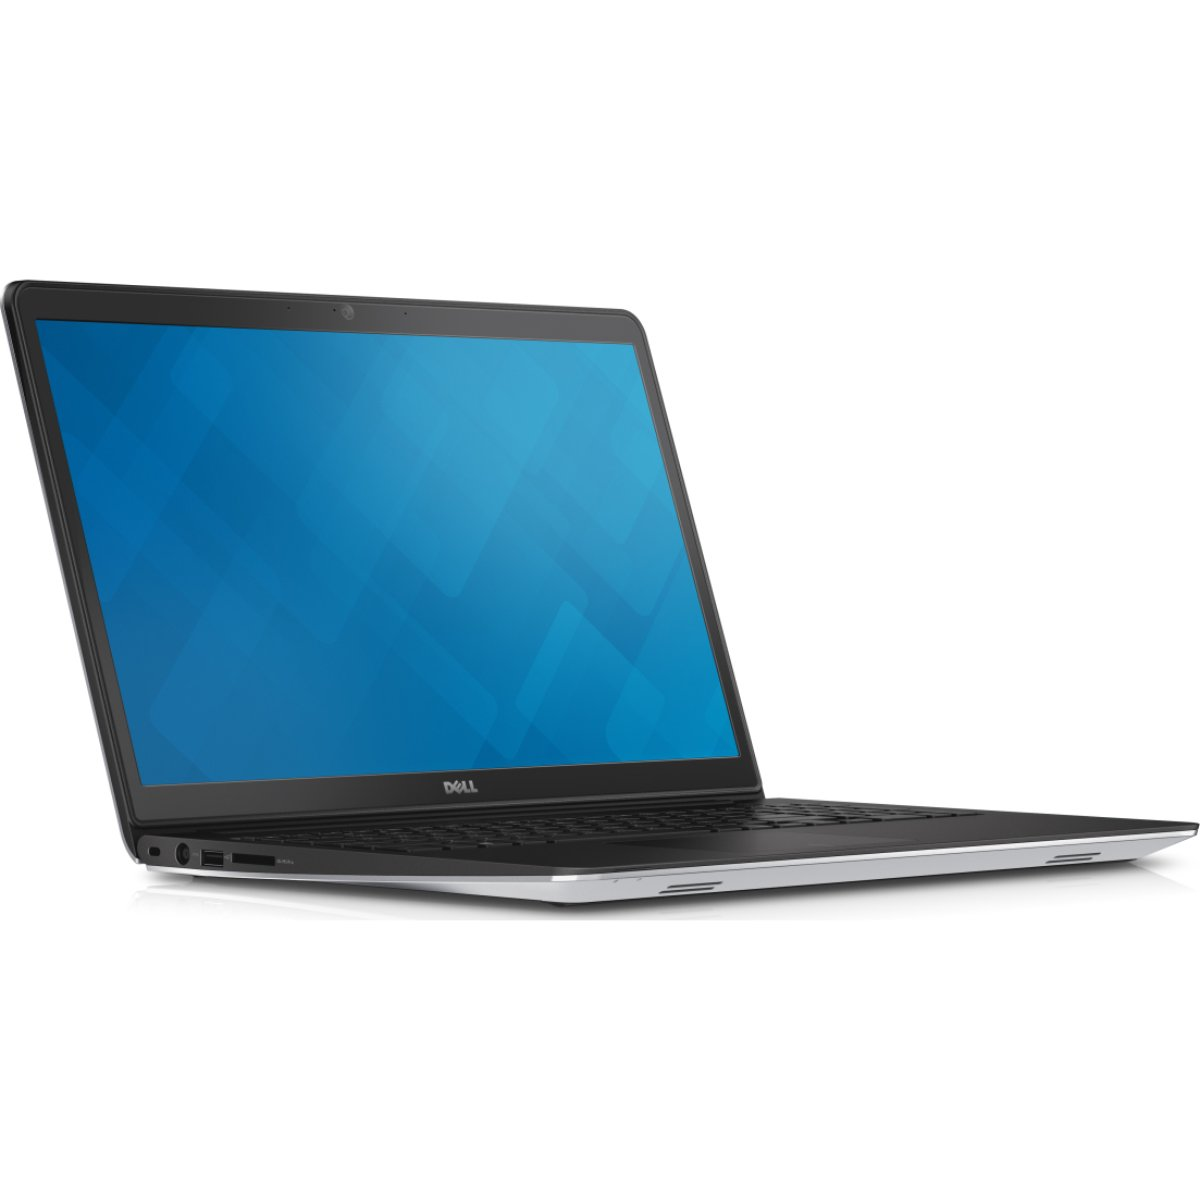 Dell-Inspiron-15-5000-Series-i5545-1250sLV-15-Inch-Laptop-AMD-A8-Processor-8GB-RAM-